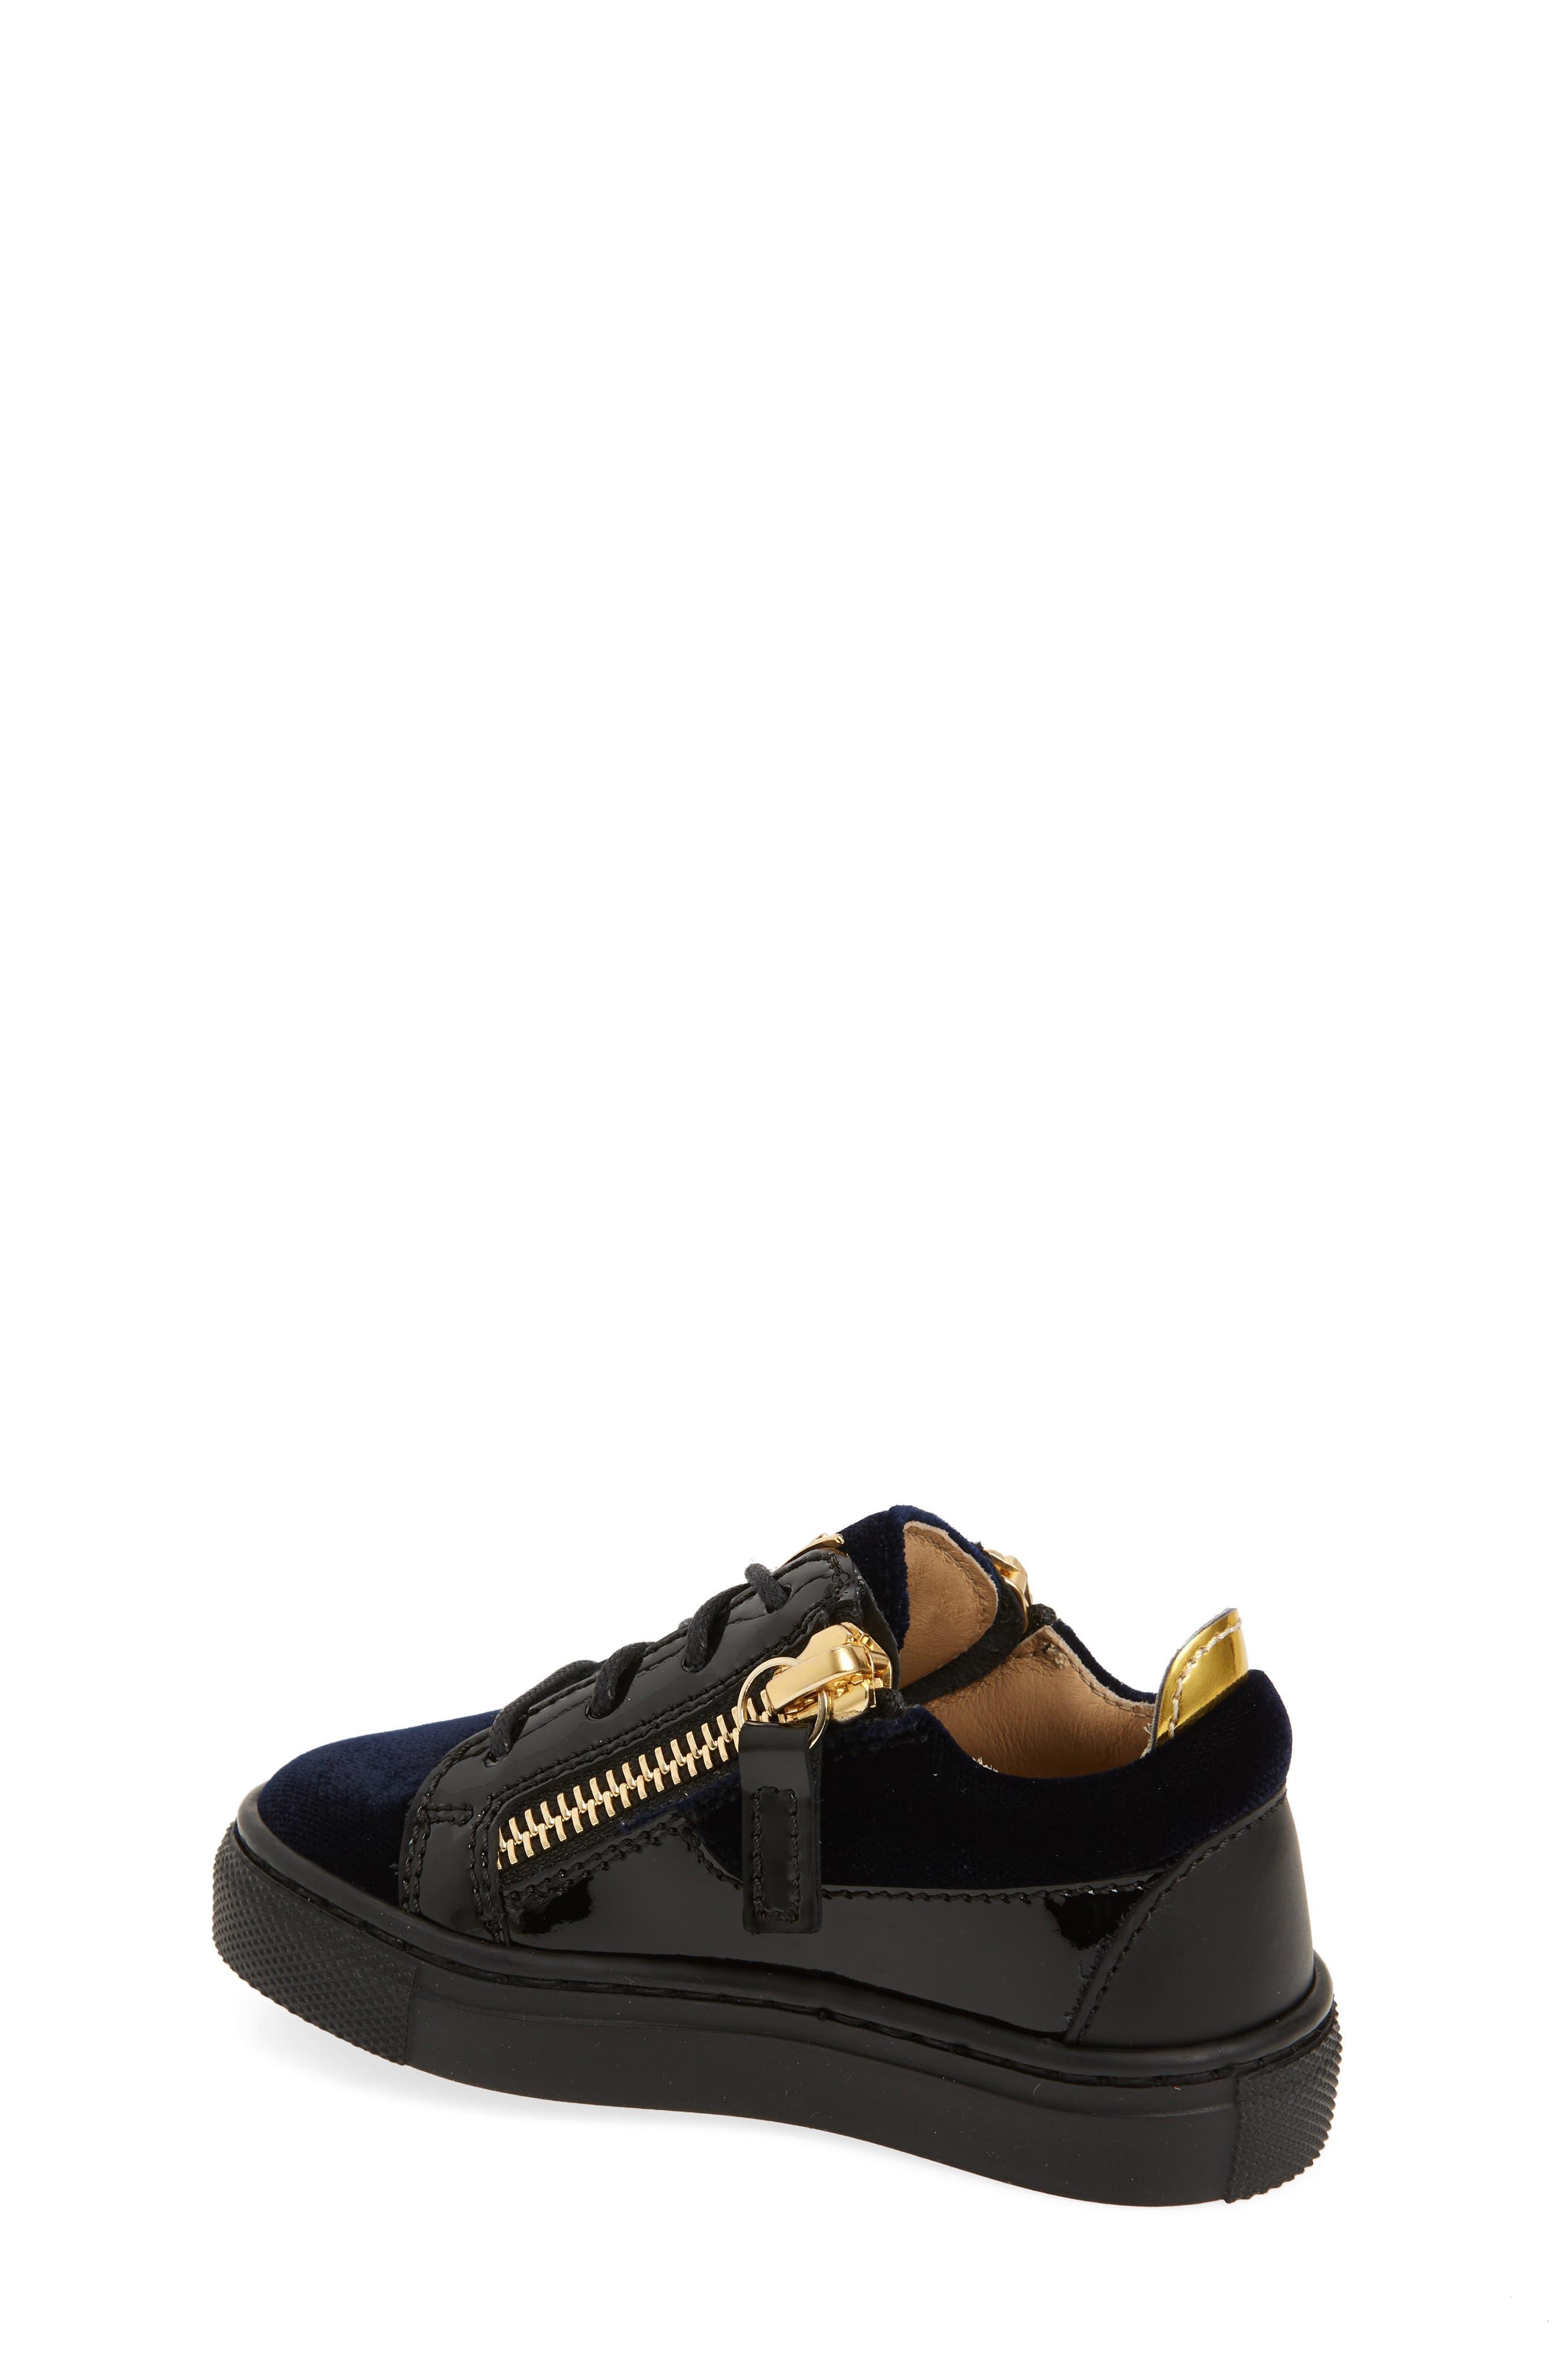 London Sneaker,                             Alternate thumbnail 2, color,                             410